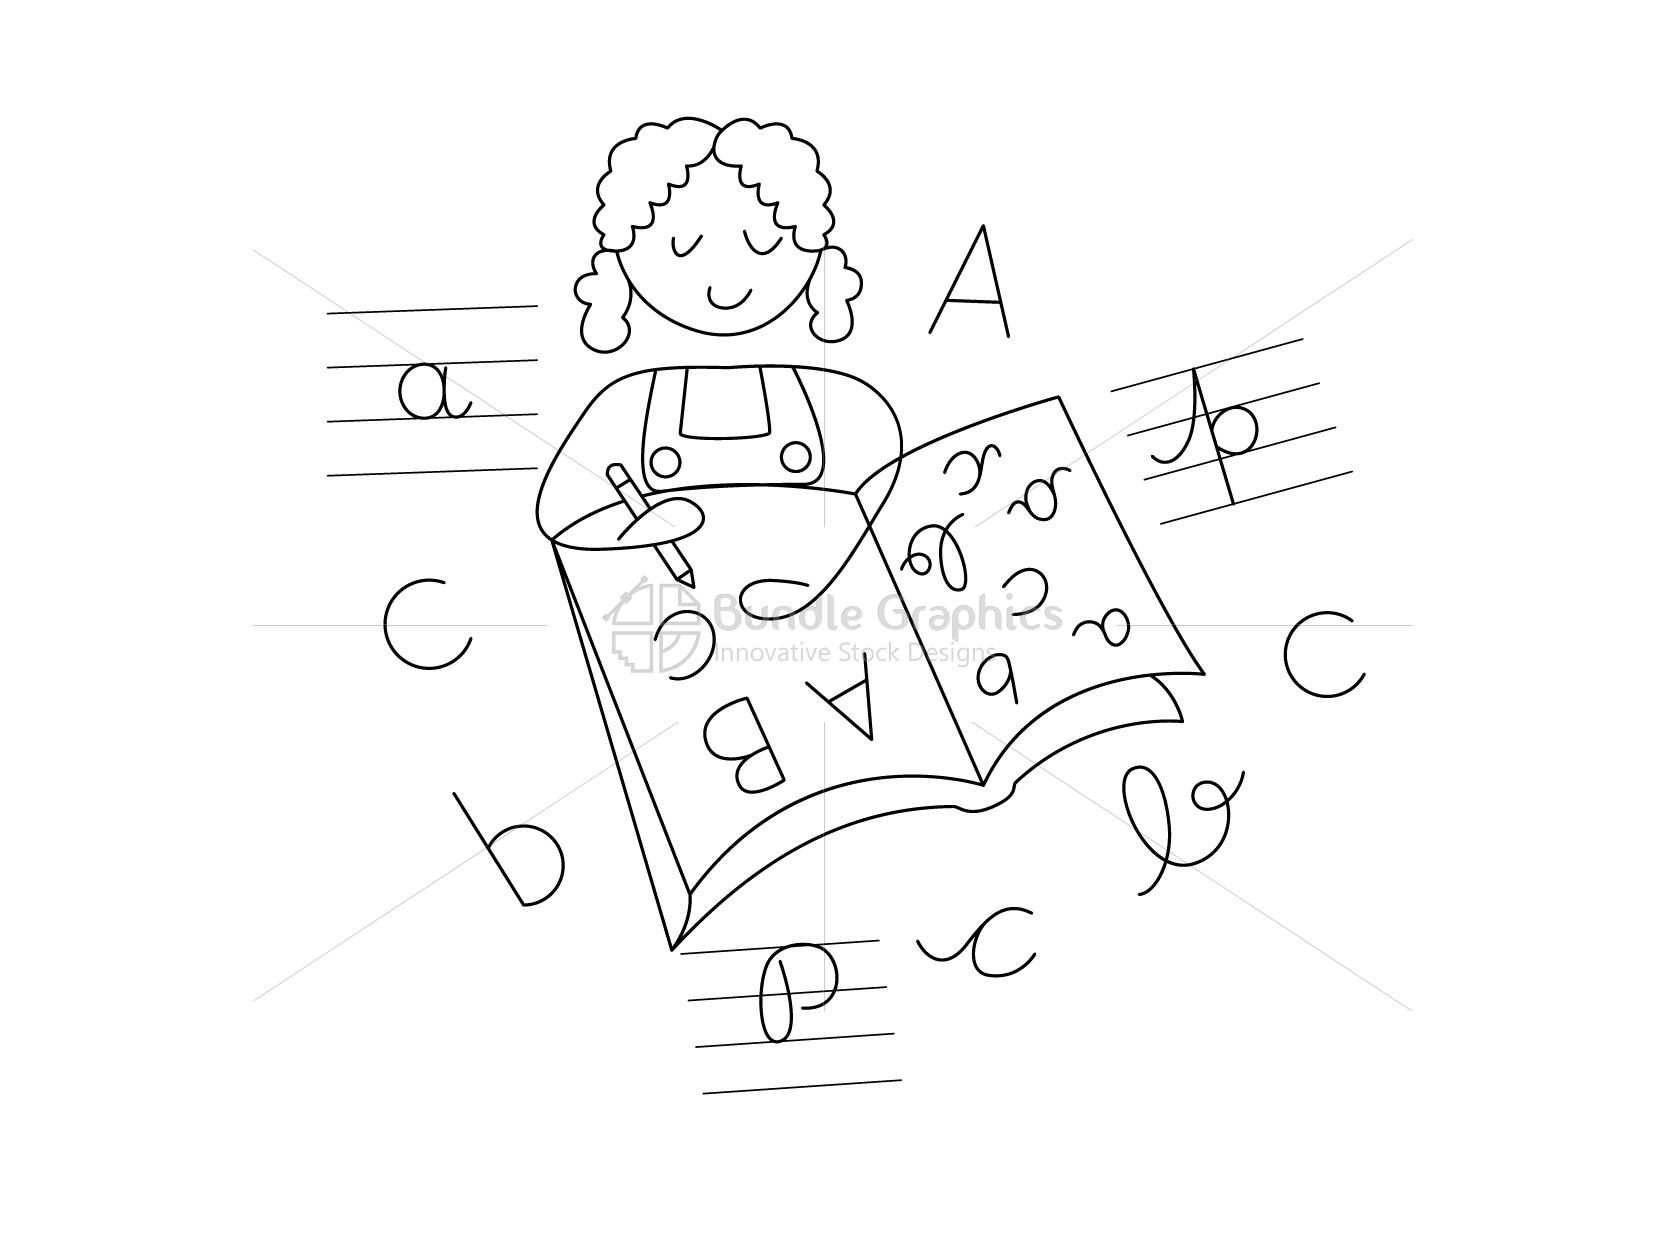 Kid Writing Alphabets Graphical Illustration example image 3